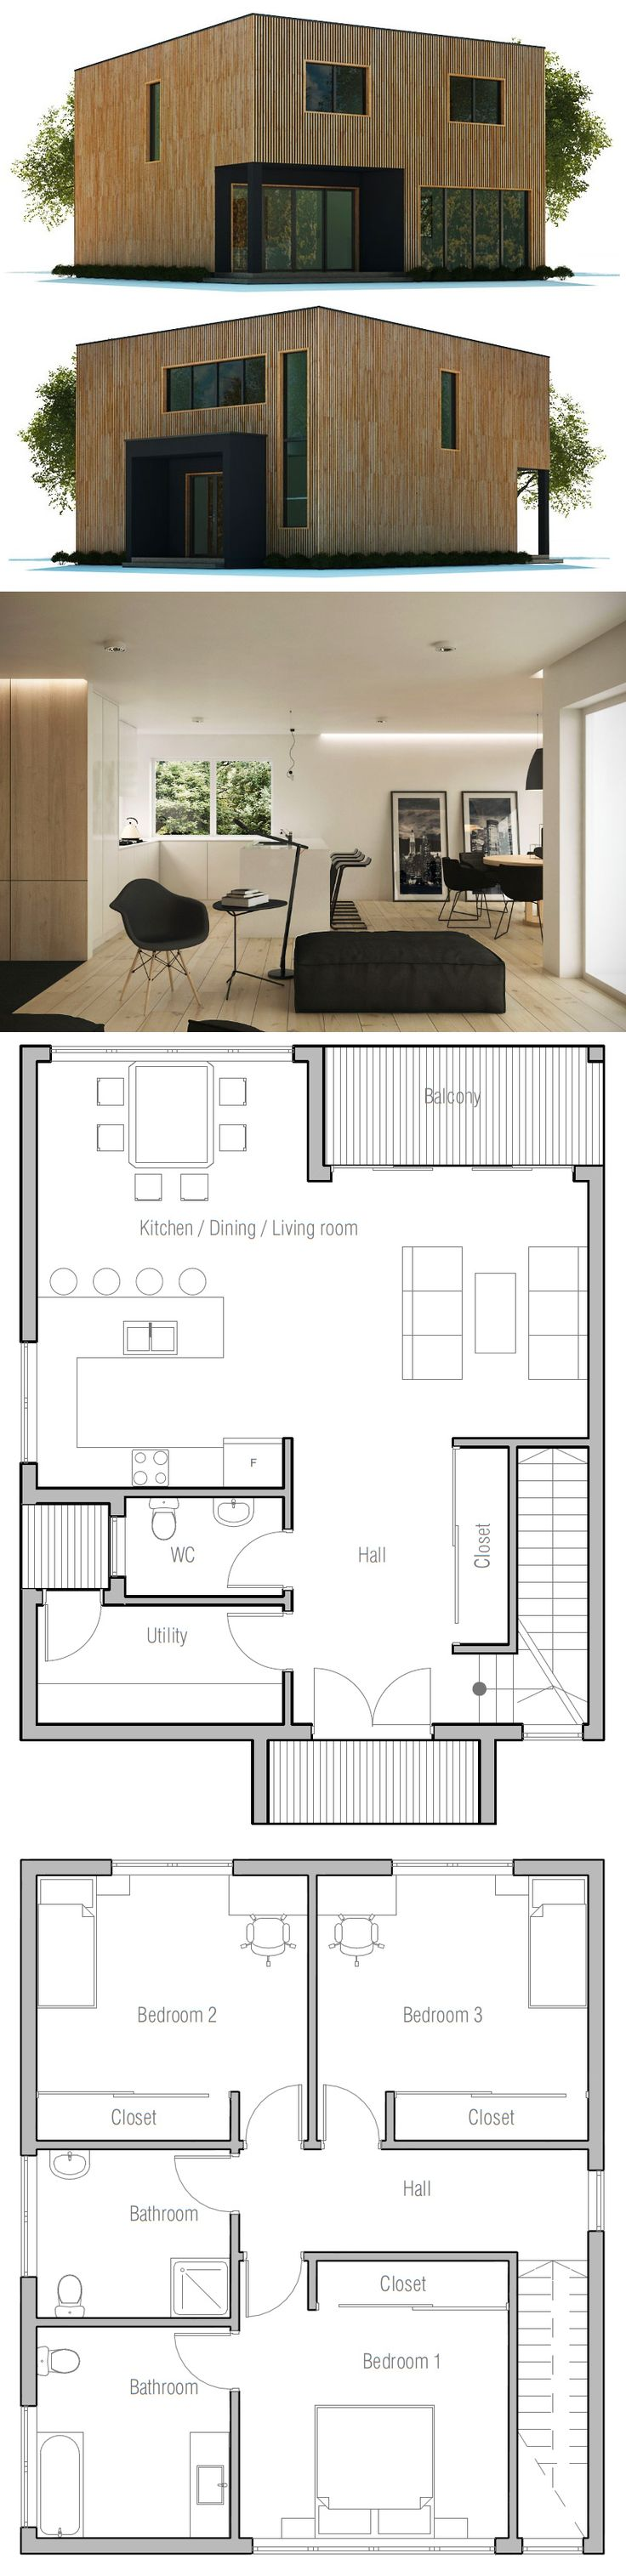 Pleasant 1000 Images About Building Plans On Pinterest Small House Plans Largest Home Design Picture Inspirations Pitcheantrous